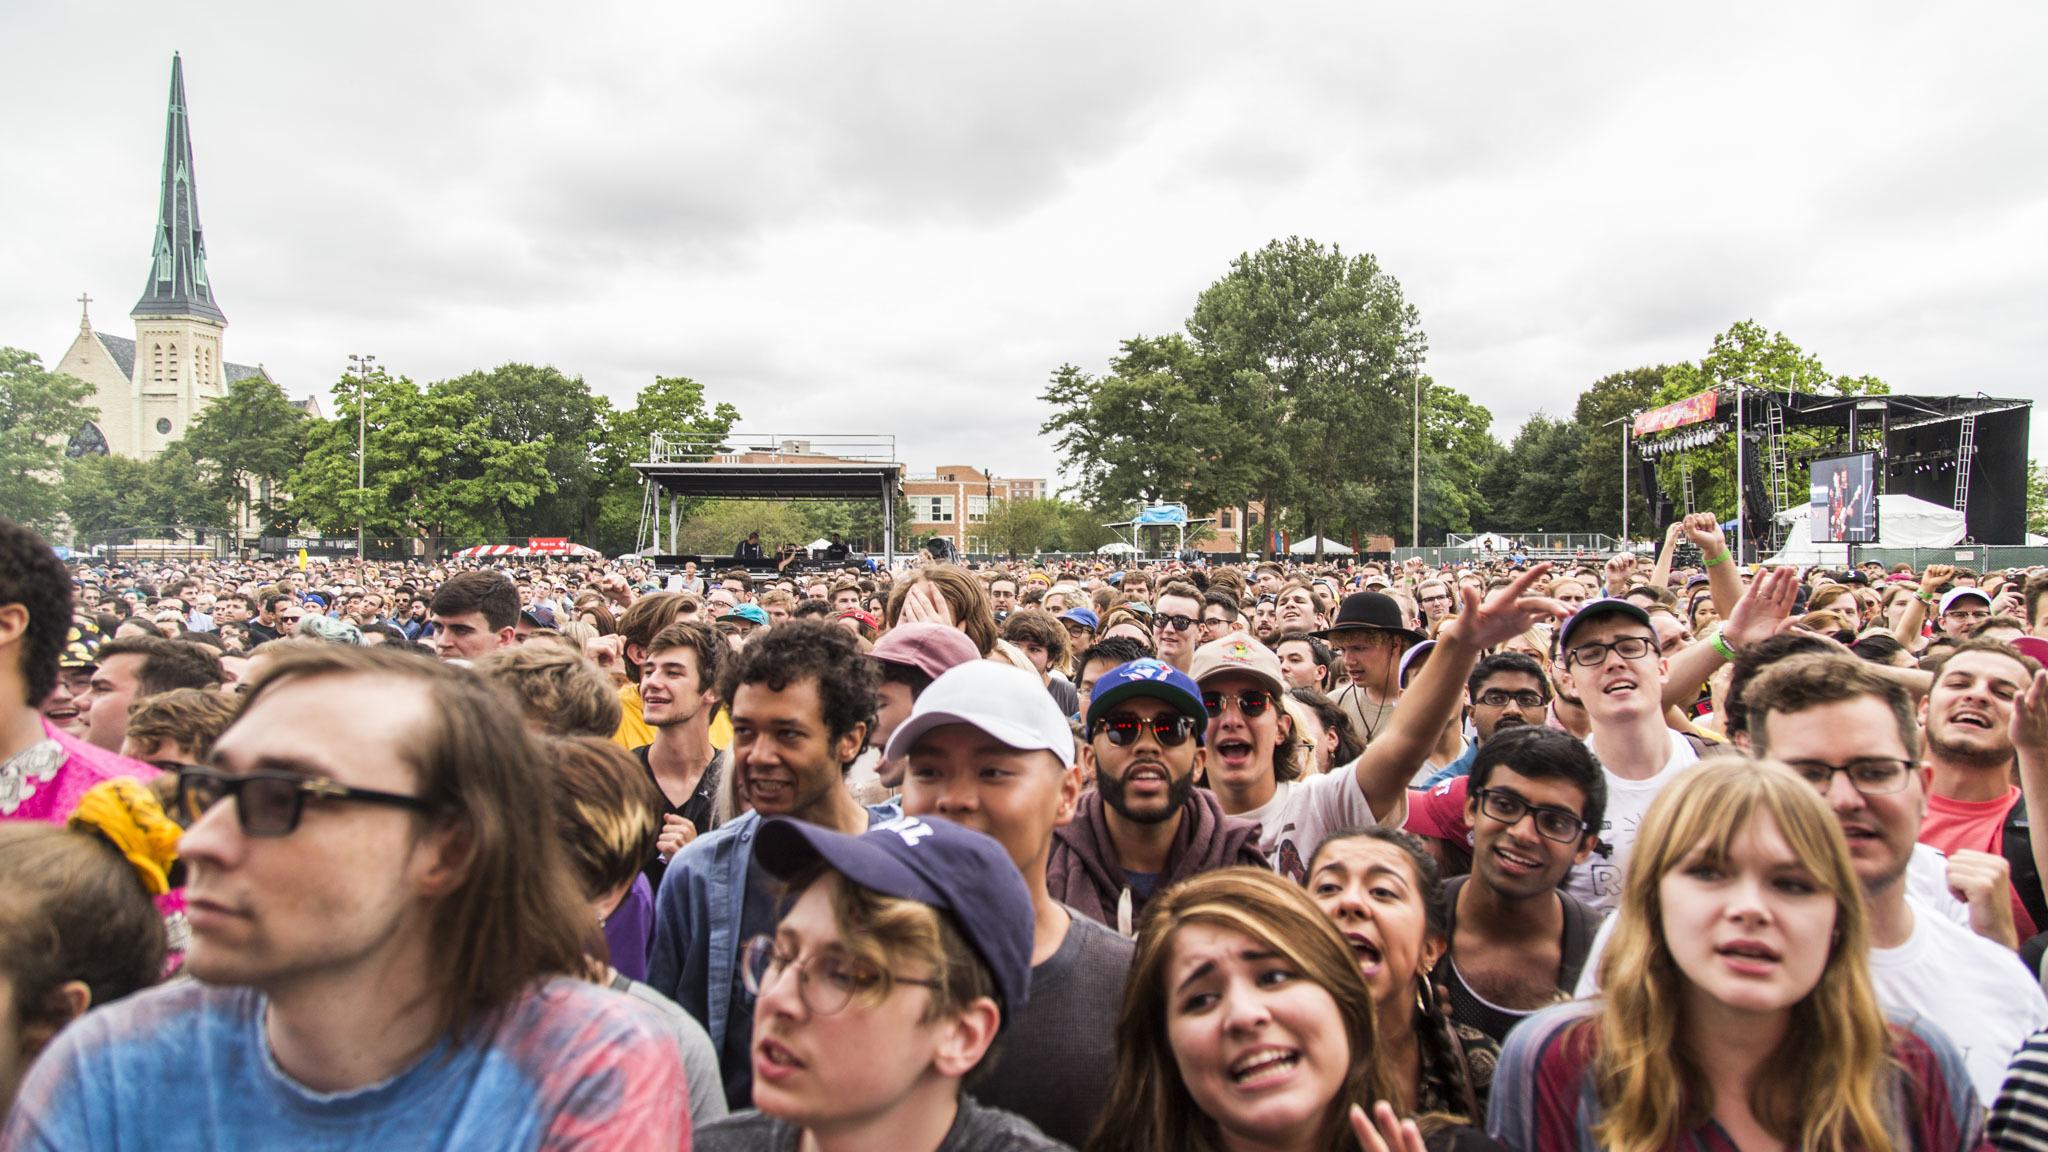 Pitchfork Music Festival 2016, Friday